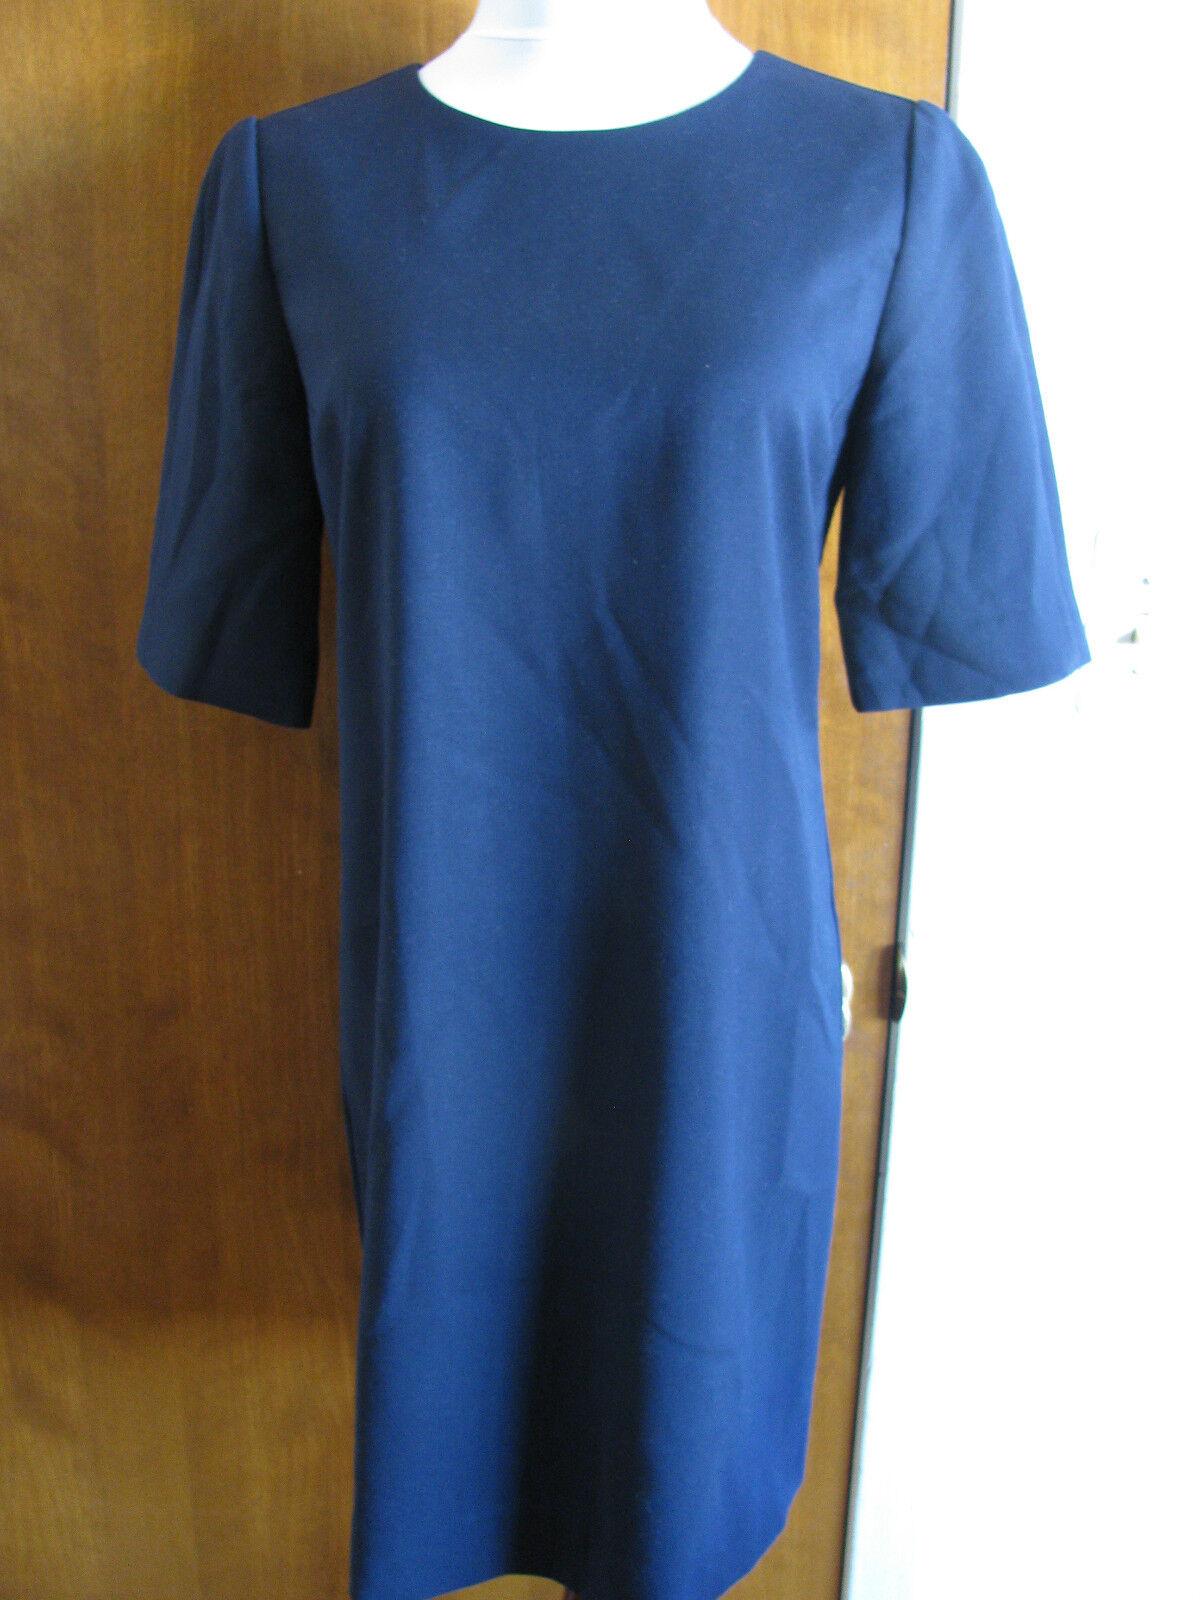 Gap women's navy dress size 8, 14 NWT